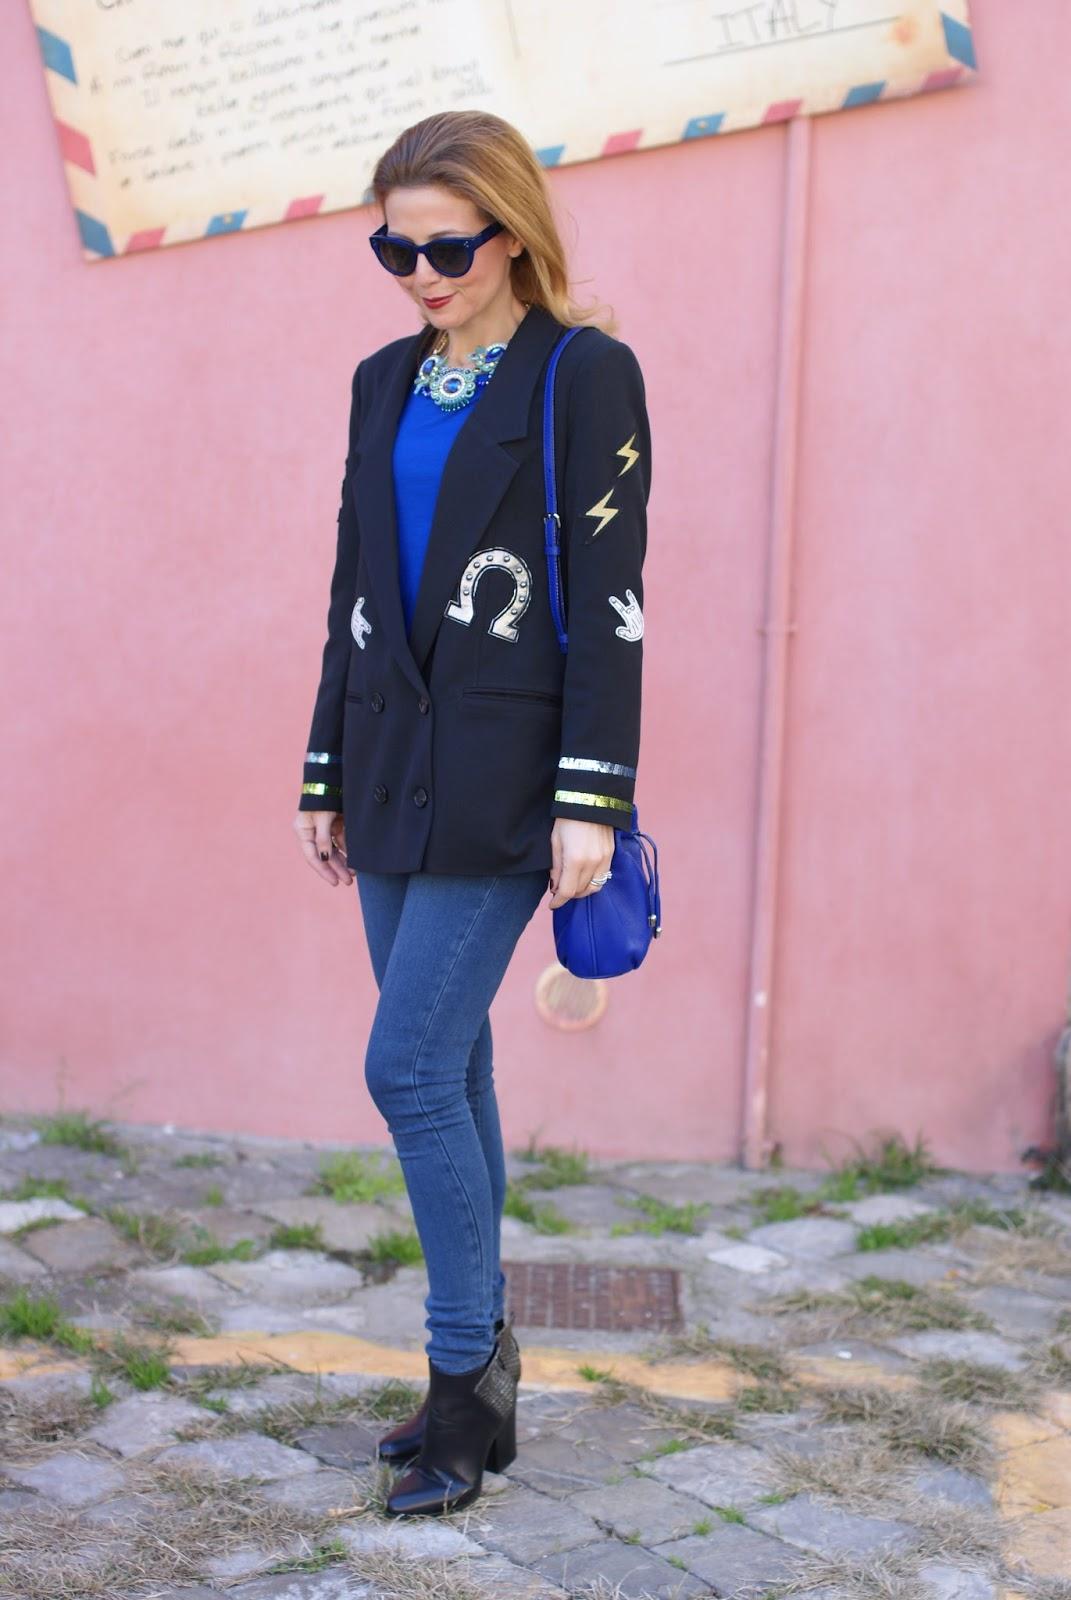 Vogos appliqued blazer and Lorenzo Mari shoes on Fashion and Cookies fashion blog, fashion blogger style